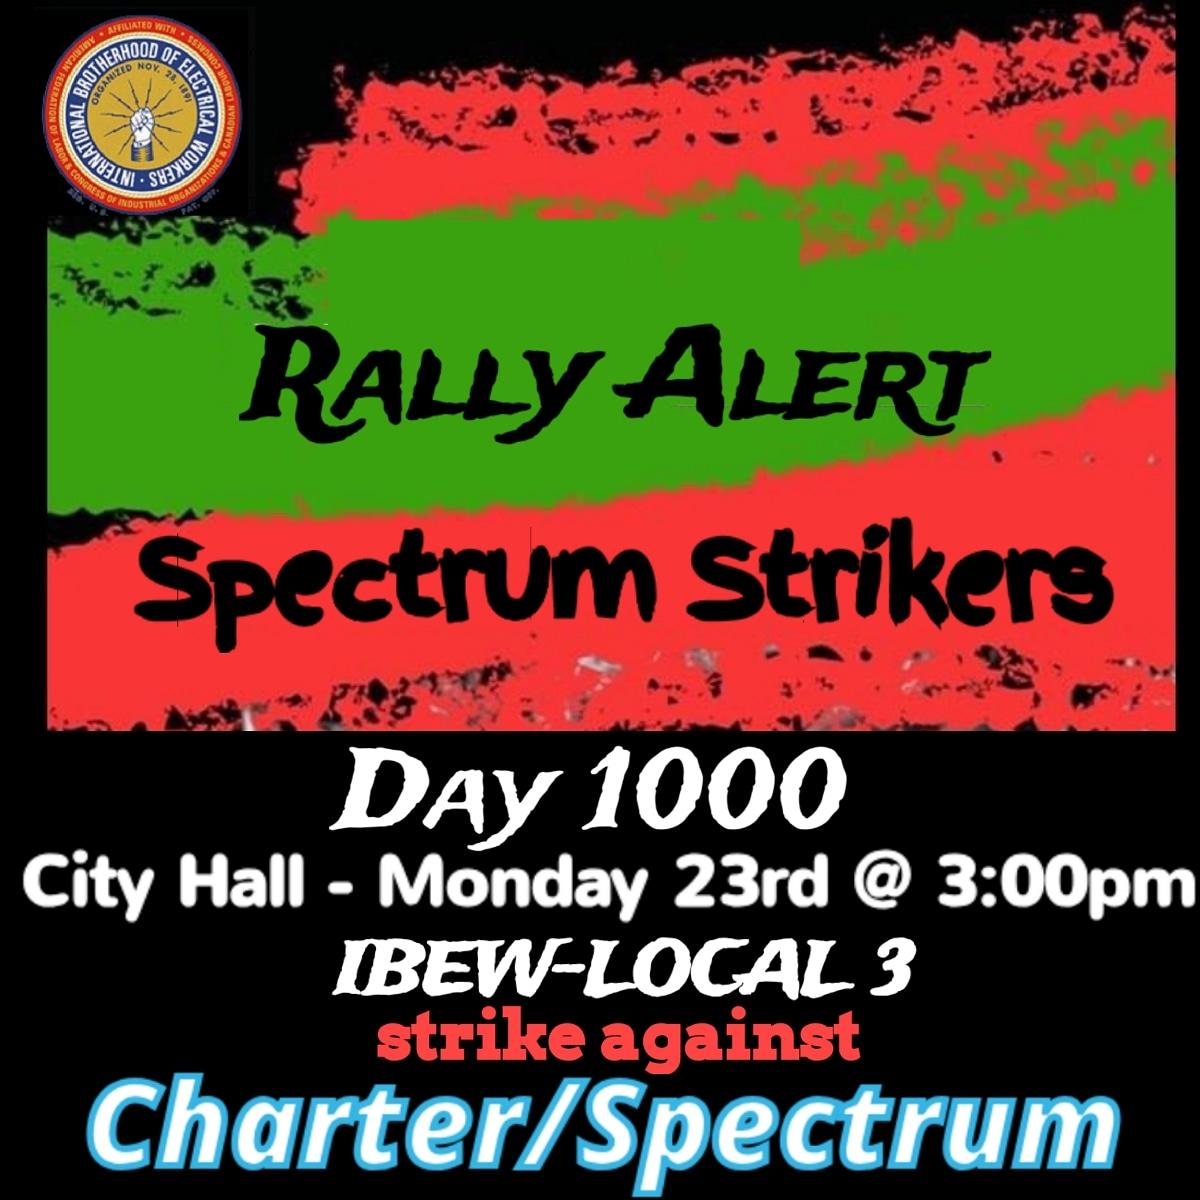 Support @IBEWLocalUnion3 Tech's, 1000 DAY'S of the #SPECTRUMSTRIKE on DEC 23  @rosannascotto @IDaneekMiller @jessicaramos @JumaaneWilliams @GingerOtis @AOC @LaborPressNY @UCOMMBlog @HeyNowJO @CountMeInNYC @GloriaPazmino @MikeBloomberg @NYCCouncil @JustinBrannan @SenSanders<br>http://pic.twitter.com/dEVl8vd38e